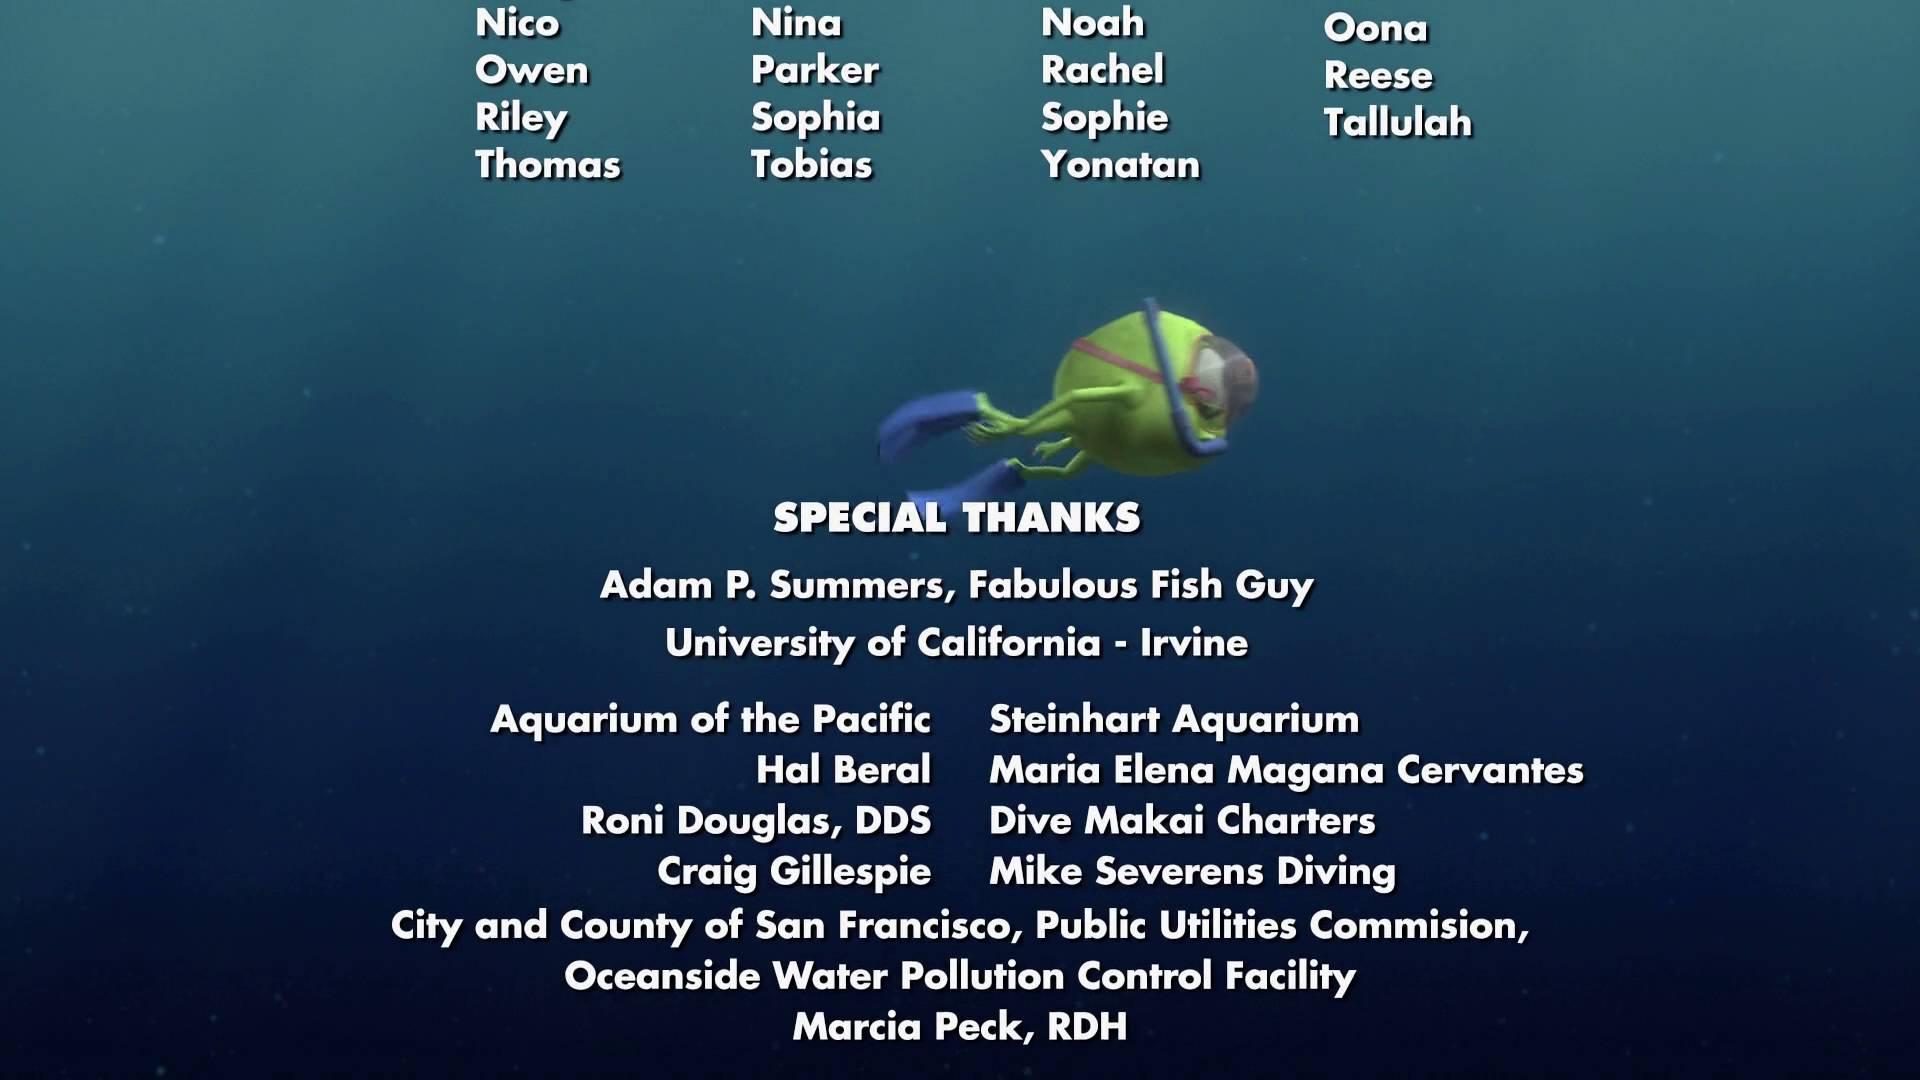 maxresdefault 1 21 Of The Cheekiest Easter Eggs You Missed In Pixar Movies